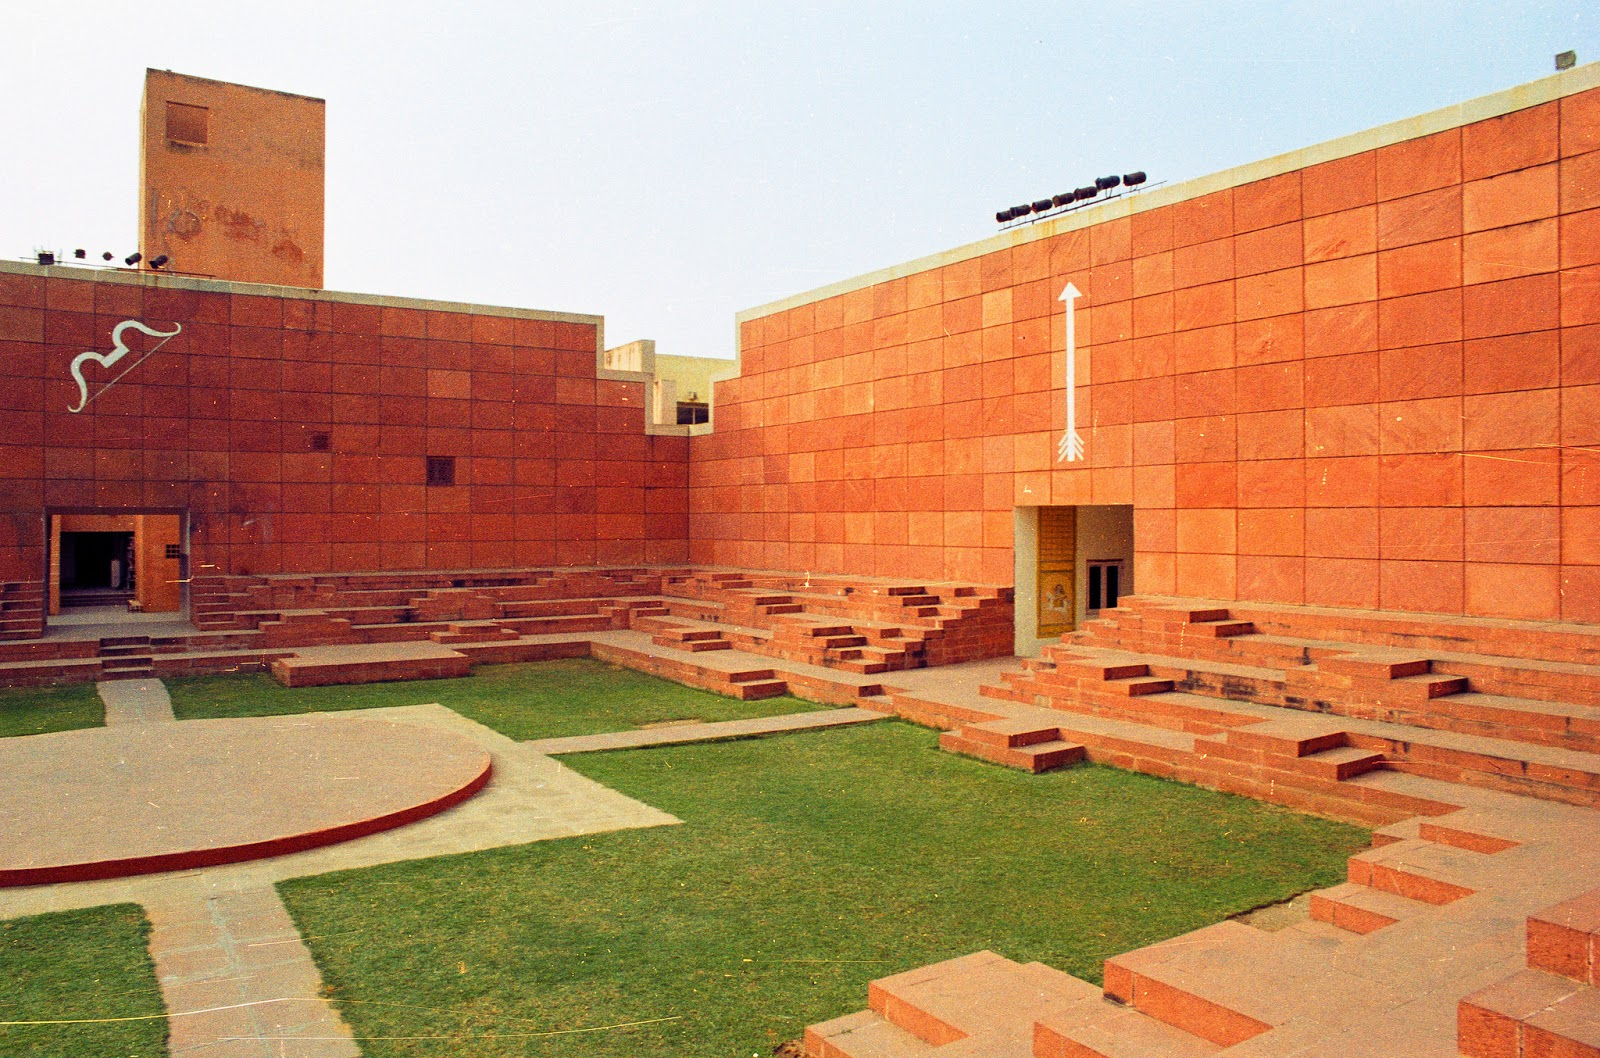 jaipur architecture Apply to 318 architecture jobs in jaipur on naukricom, india's no1 job portal explore architecture job openings in jaipur now.